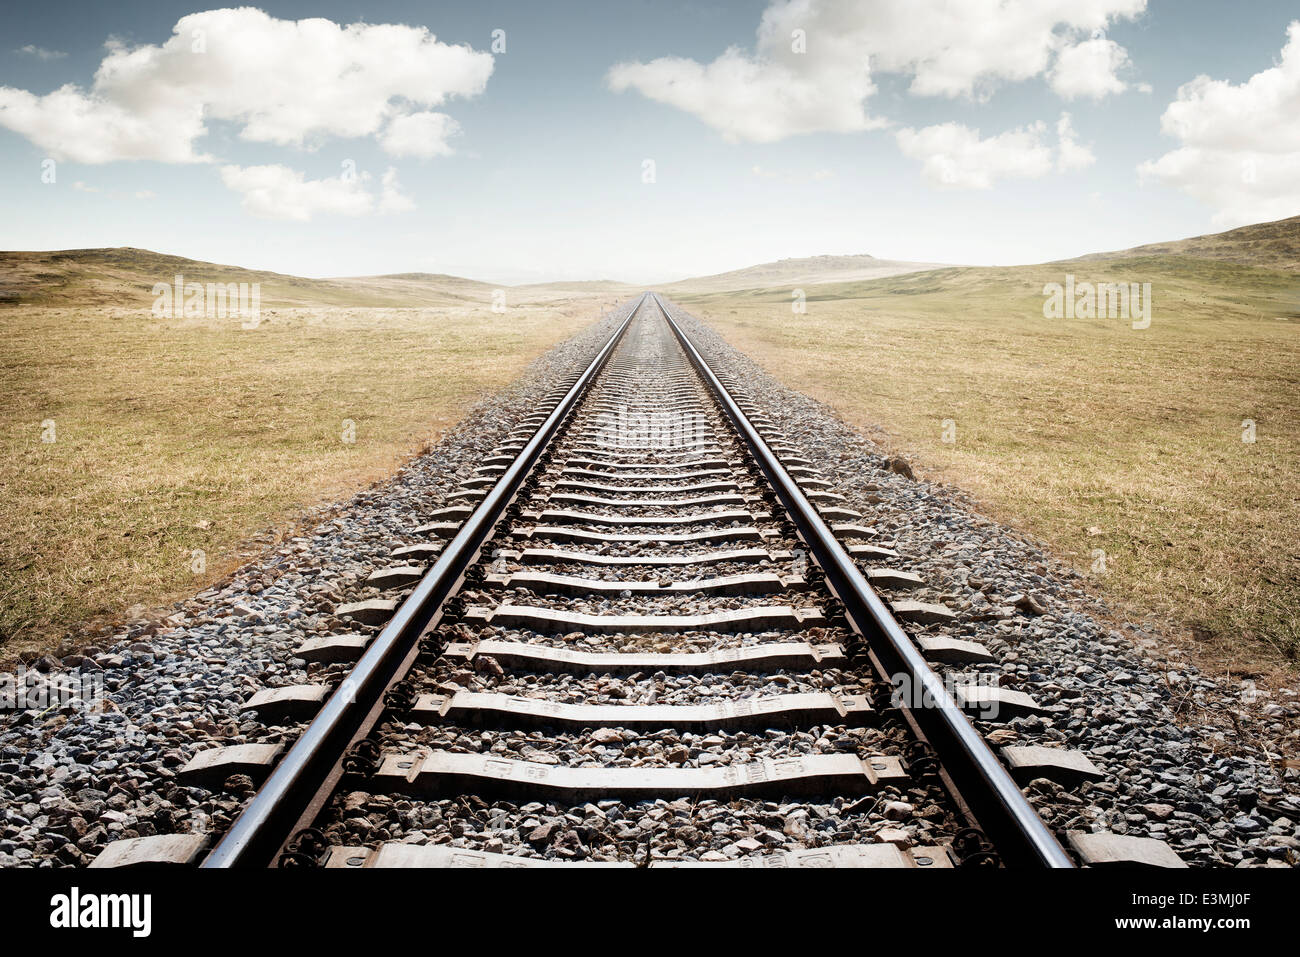 Railway Tracks. A long journey ahead. - Stock Image